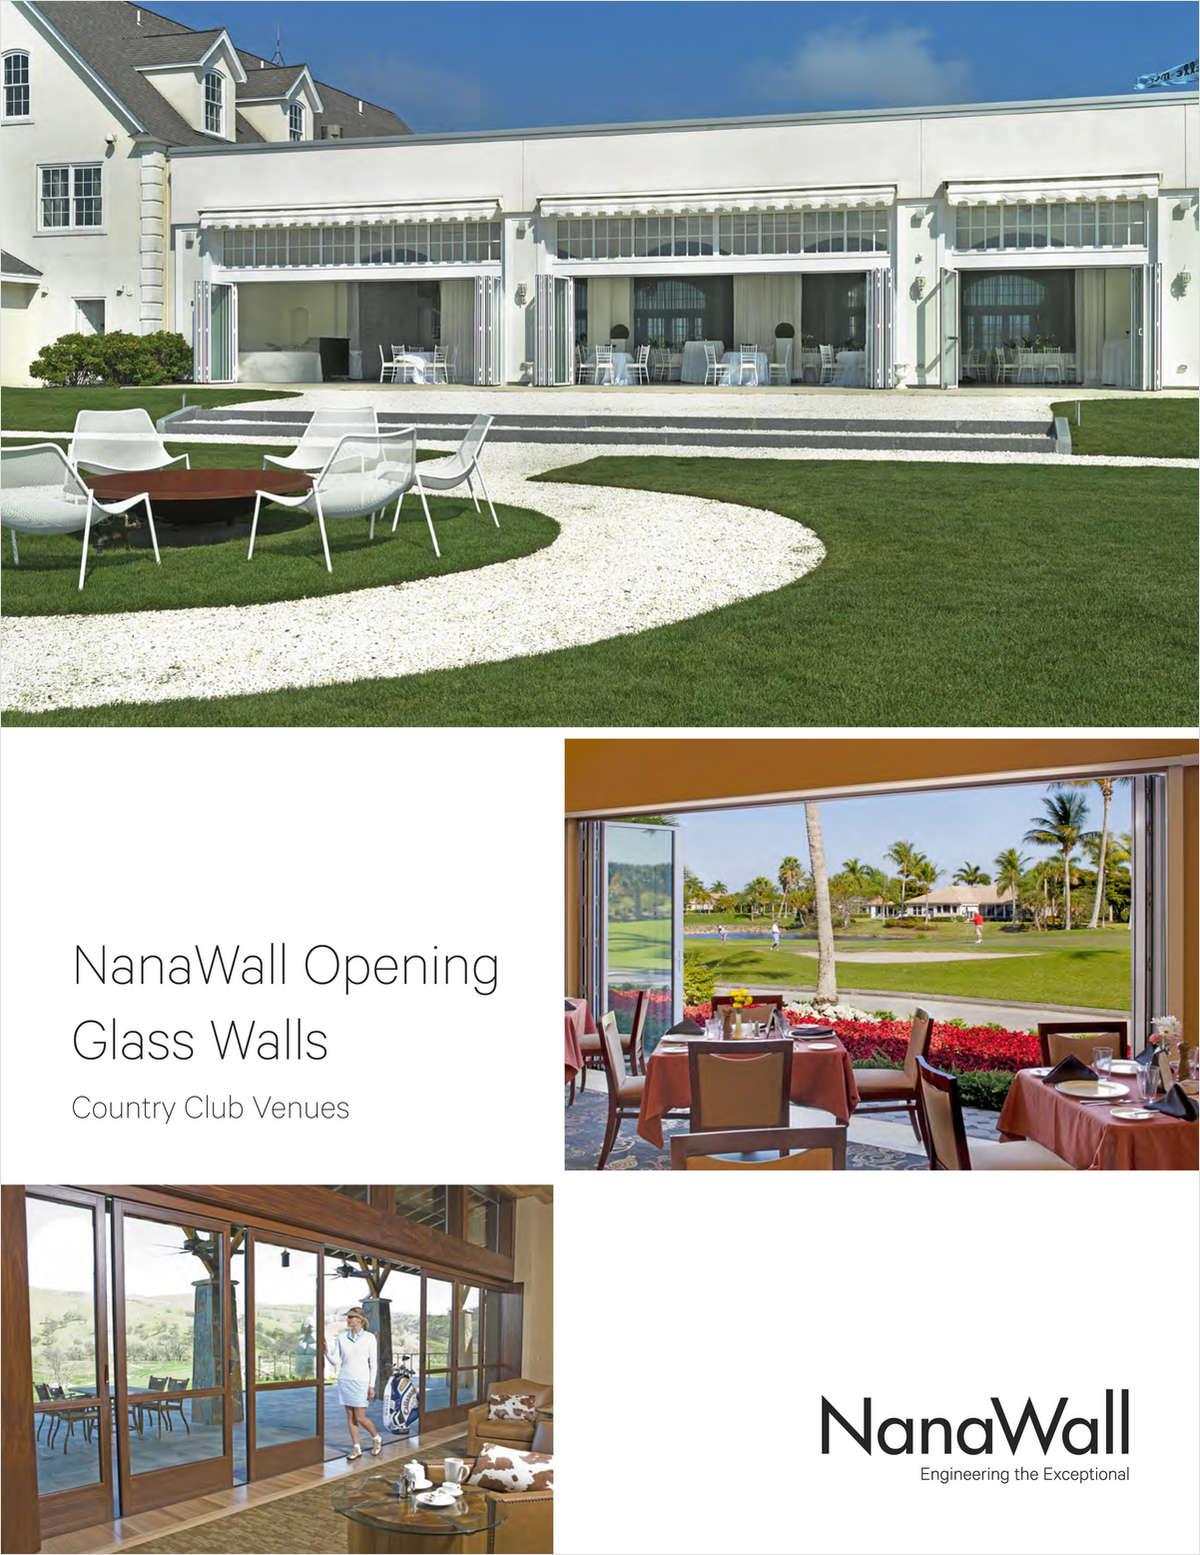 NanaWall Opening Glass Walls: Country Club Venues